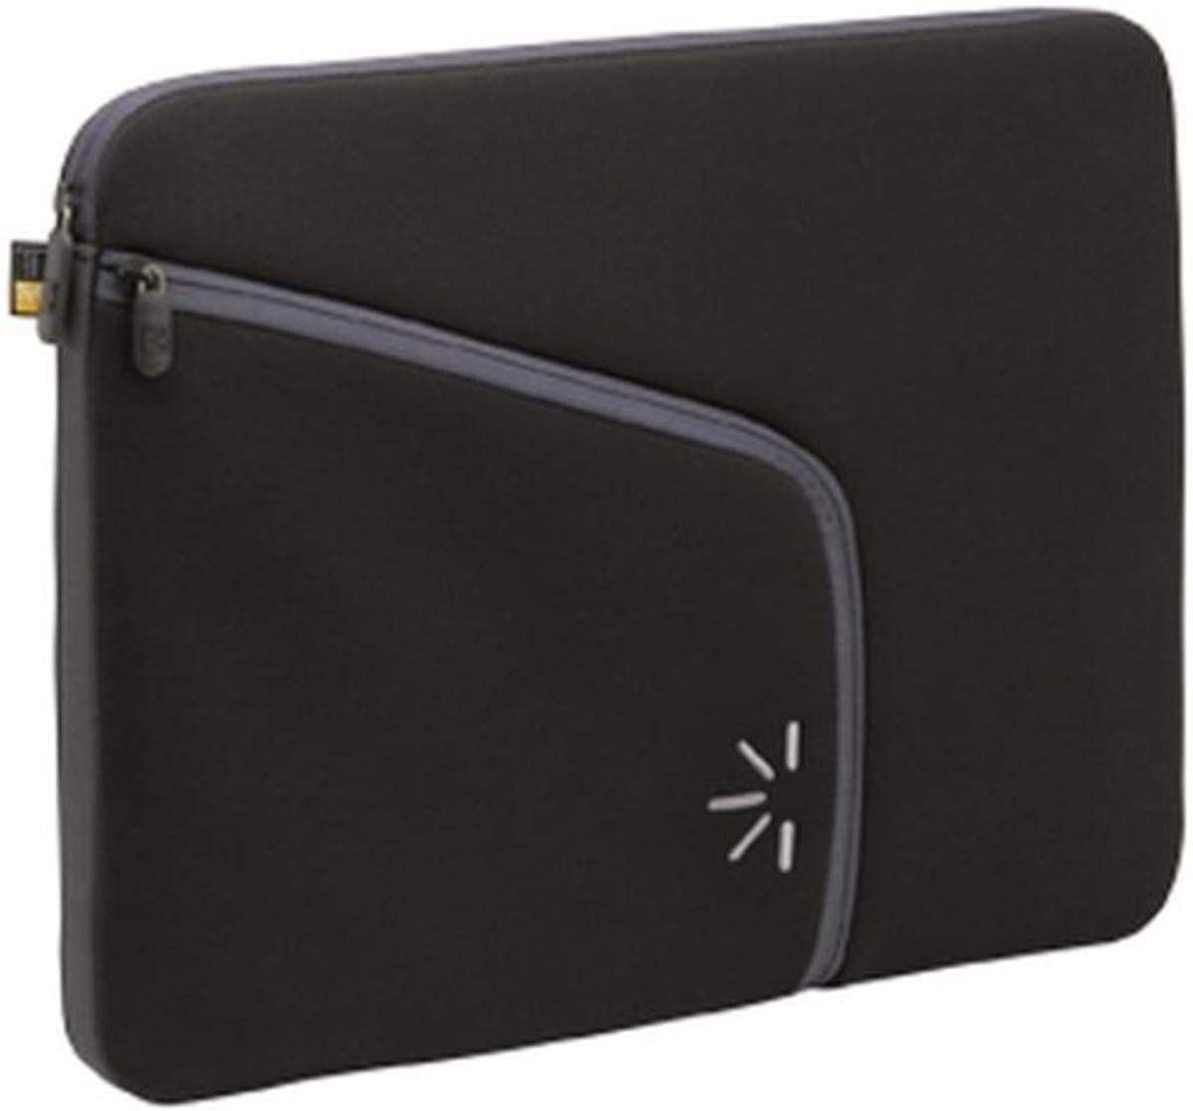 Case Logic PLS-14 BLACK 14-Inch Neoprene Laptop Sleeve (Black)